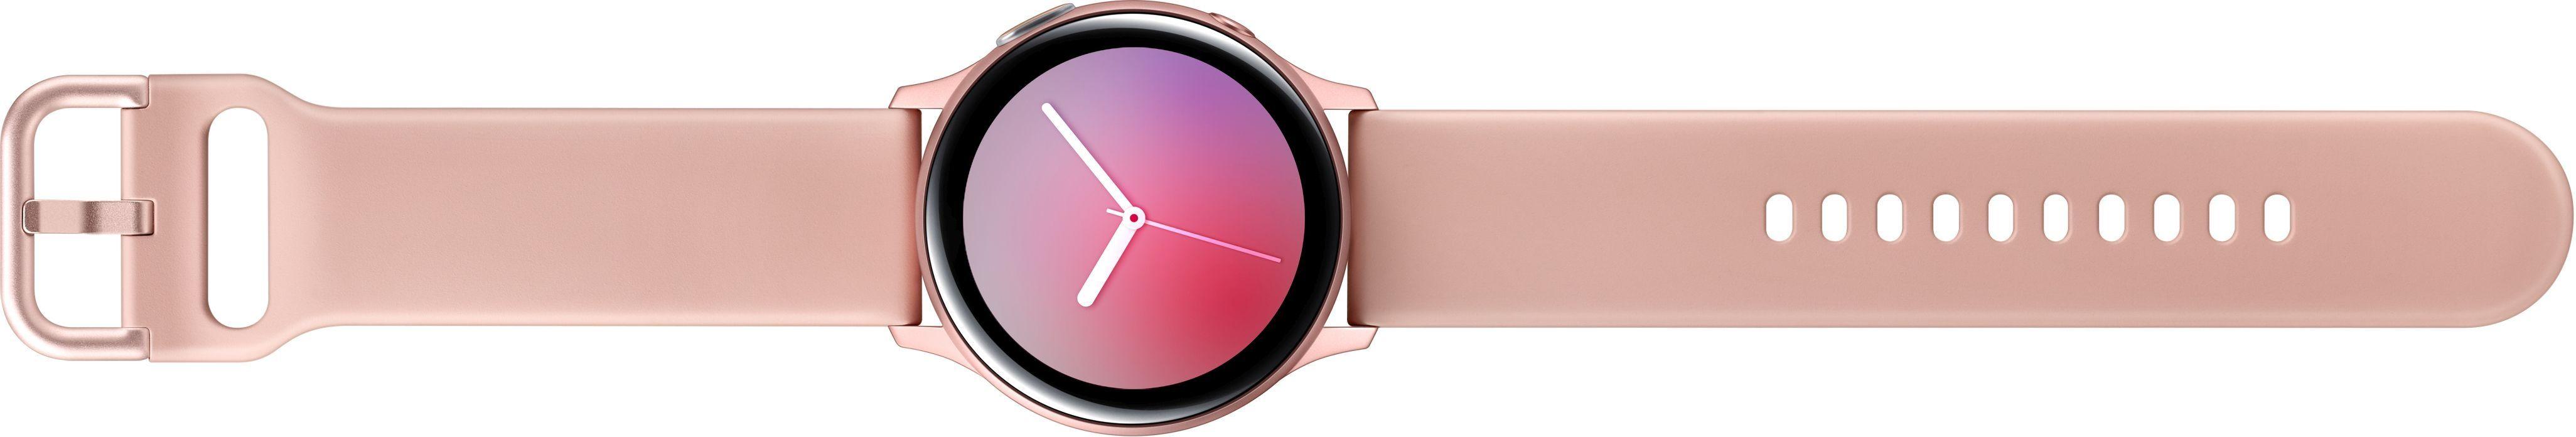 Смарт часы Samsung Galaxy Watch Active 2 40mm Aluminium (SM-R830NZDASEK) Gold от Територія твоєї техніки - 2